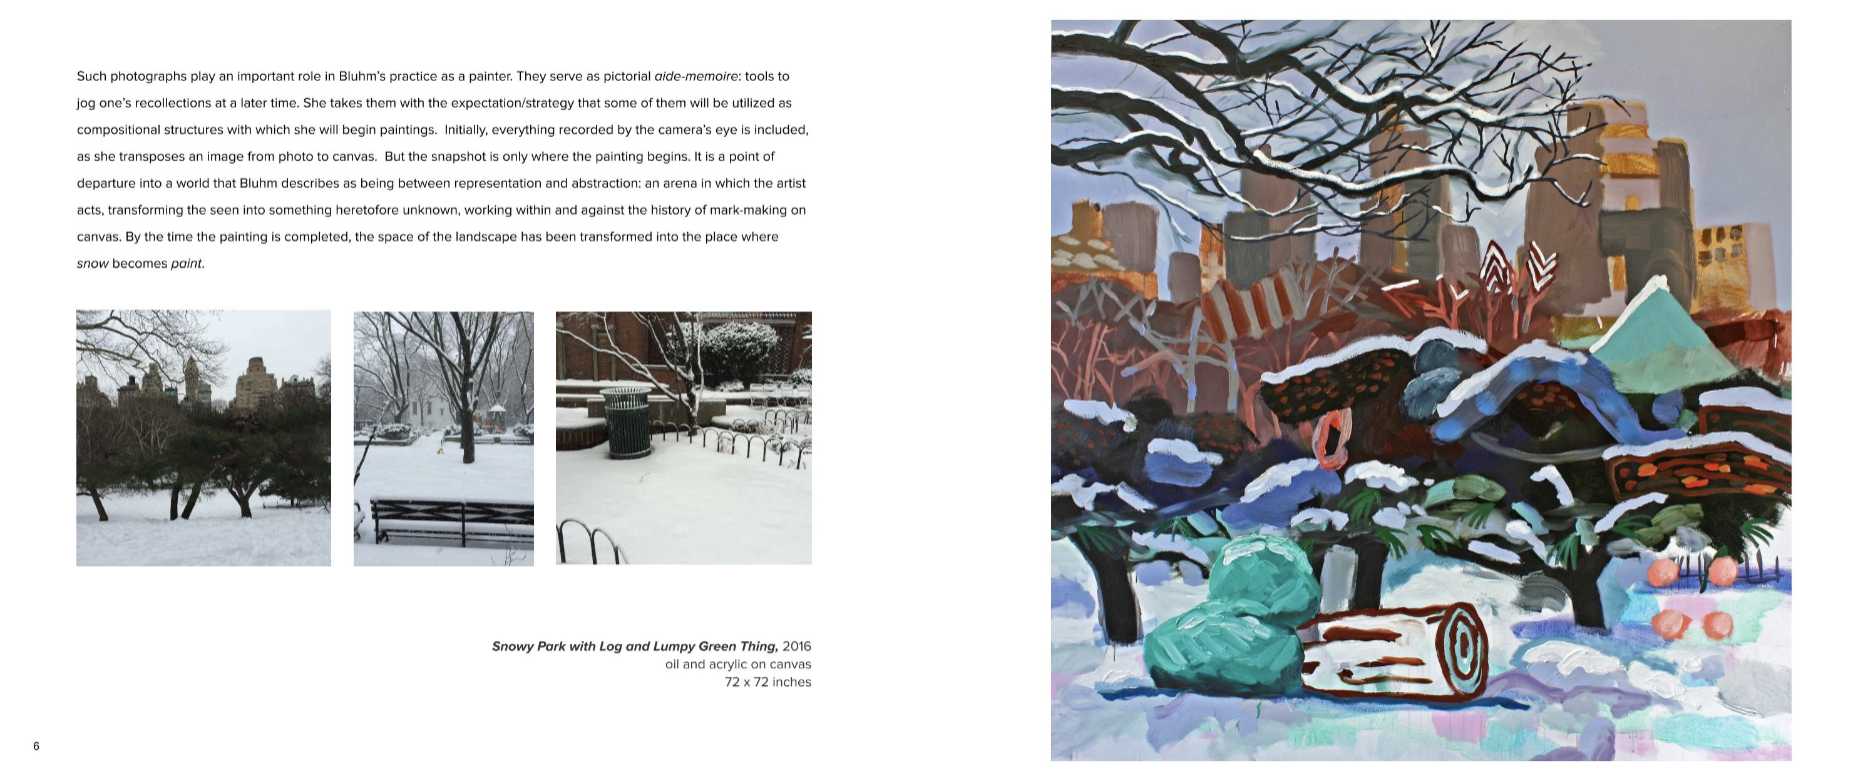 Catalogue excerpt, Susanna Blum at G. Gibson Gallery, Seattle WA 2016